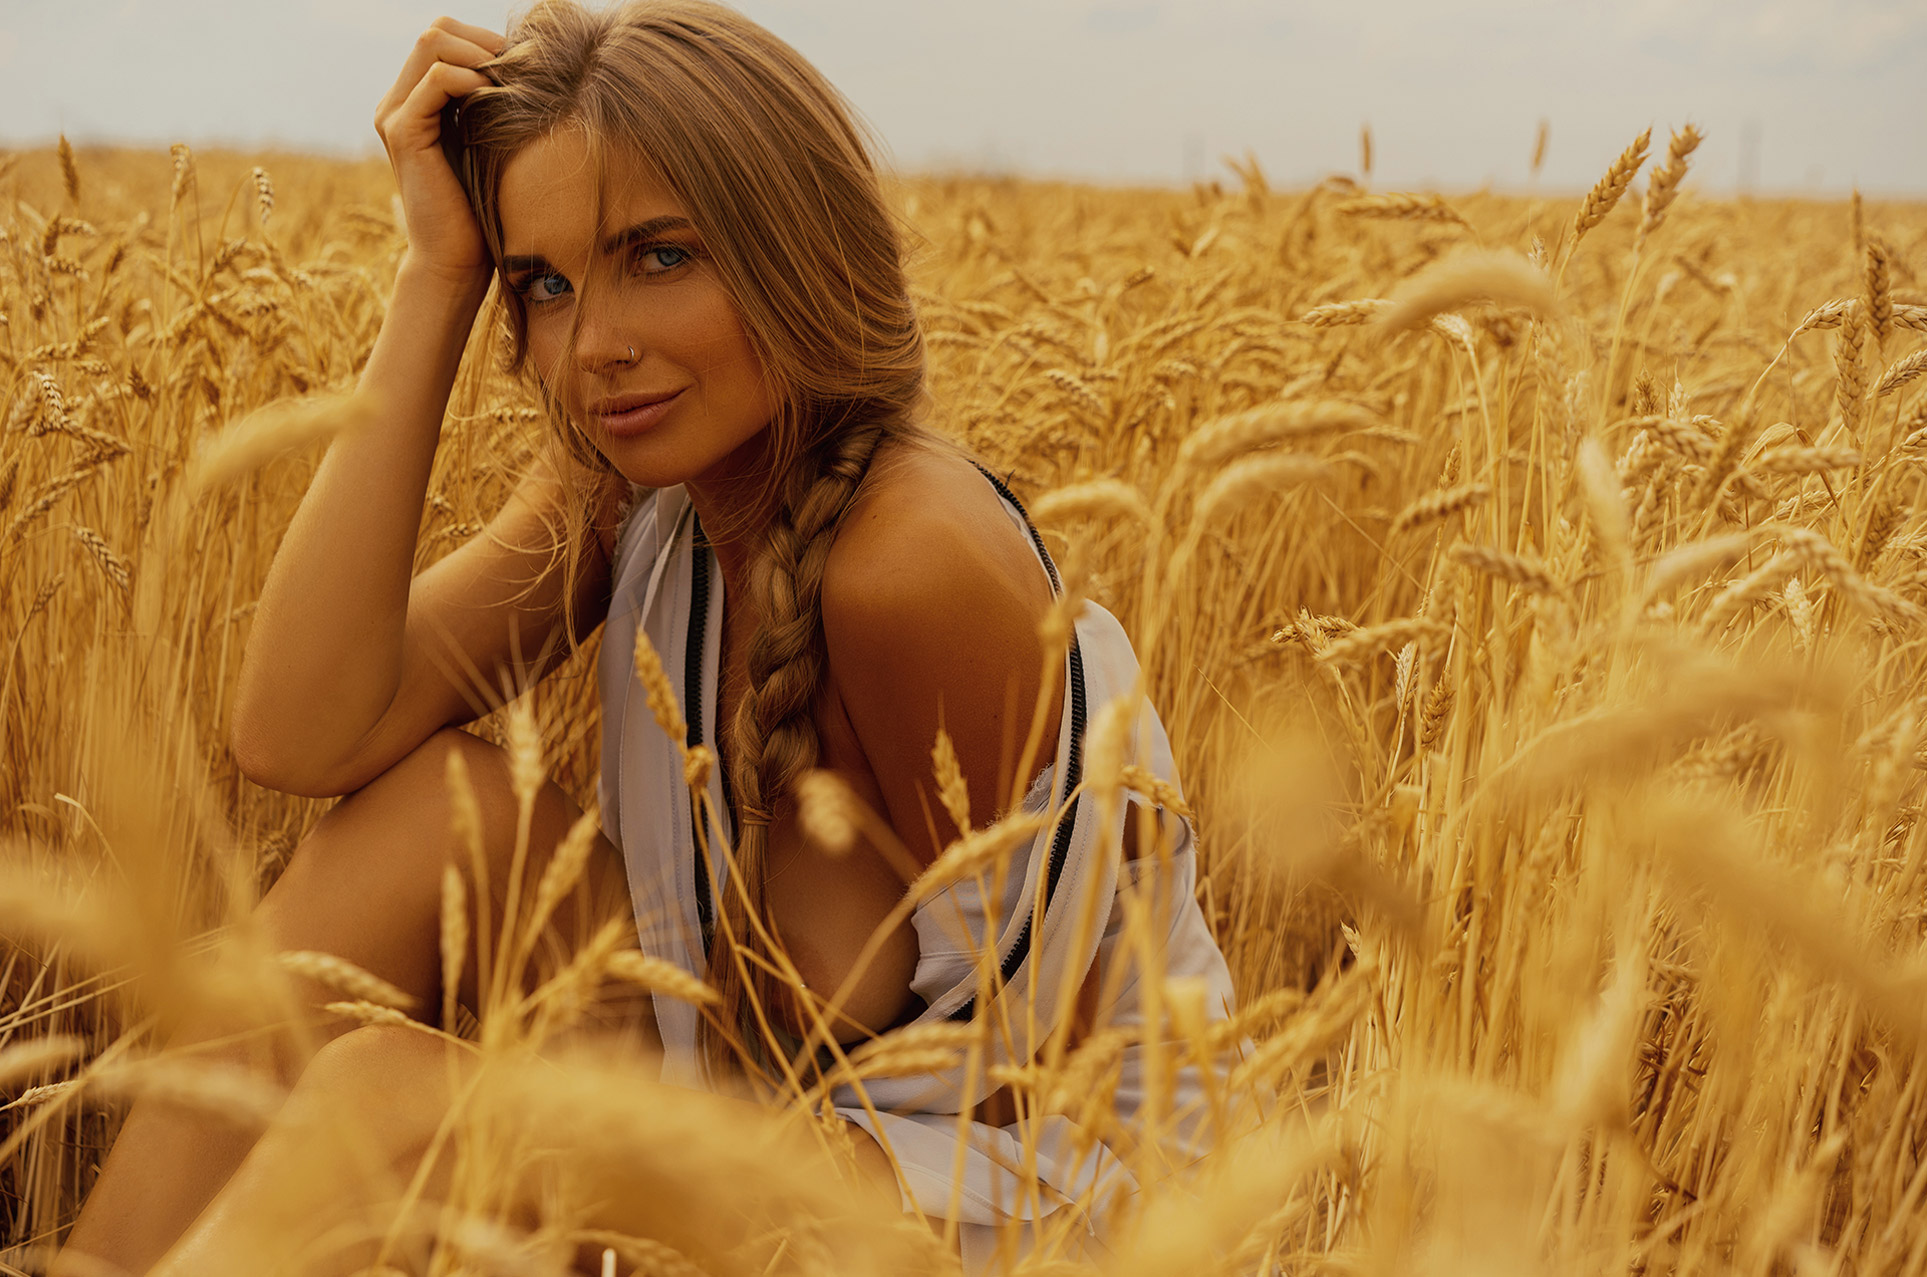 Украинская красавица на Поле чудес Матери-природы / Anna by Arthur Kaplun